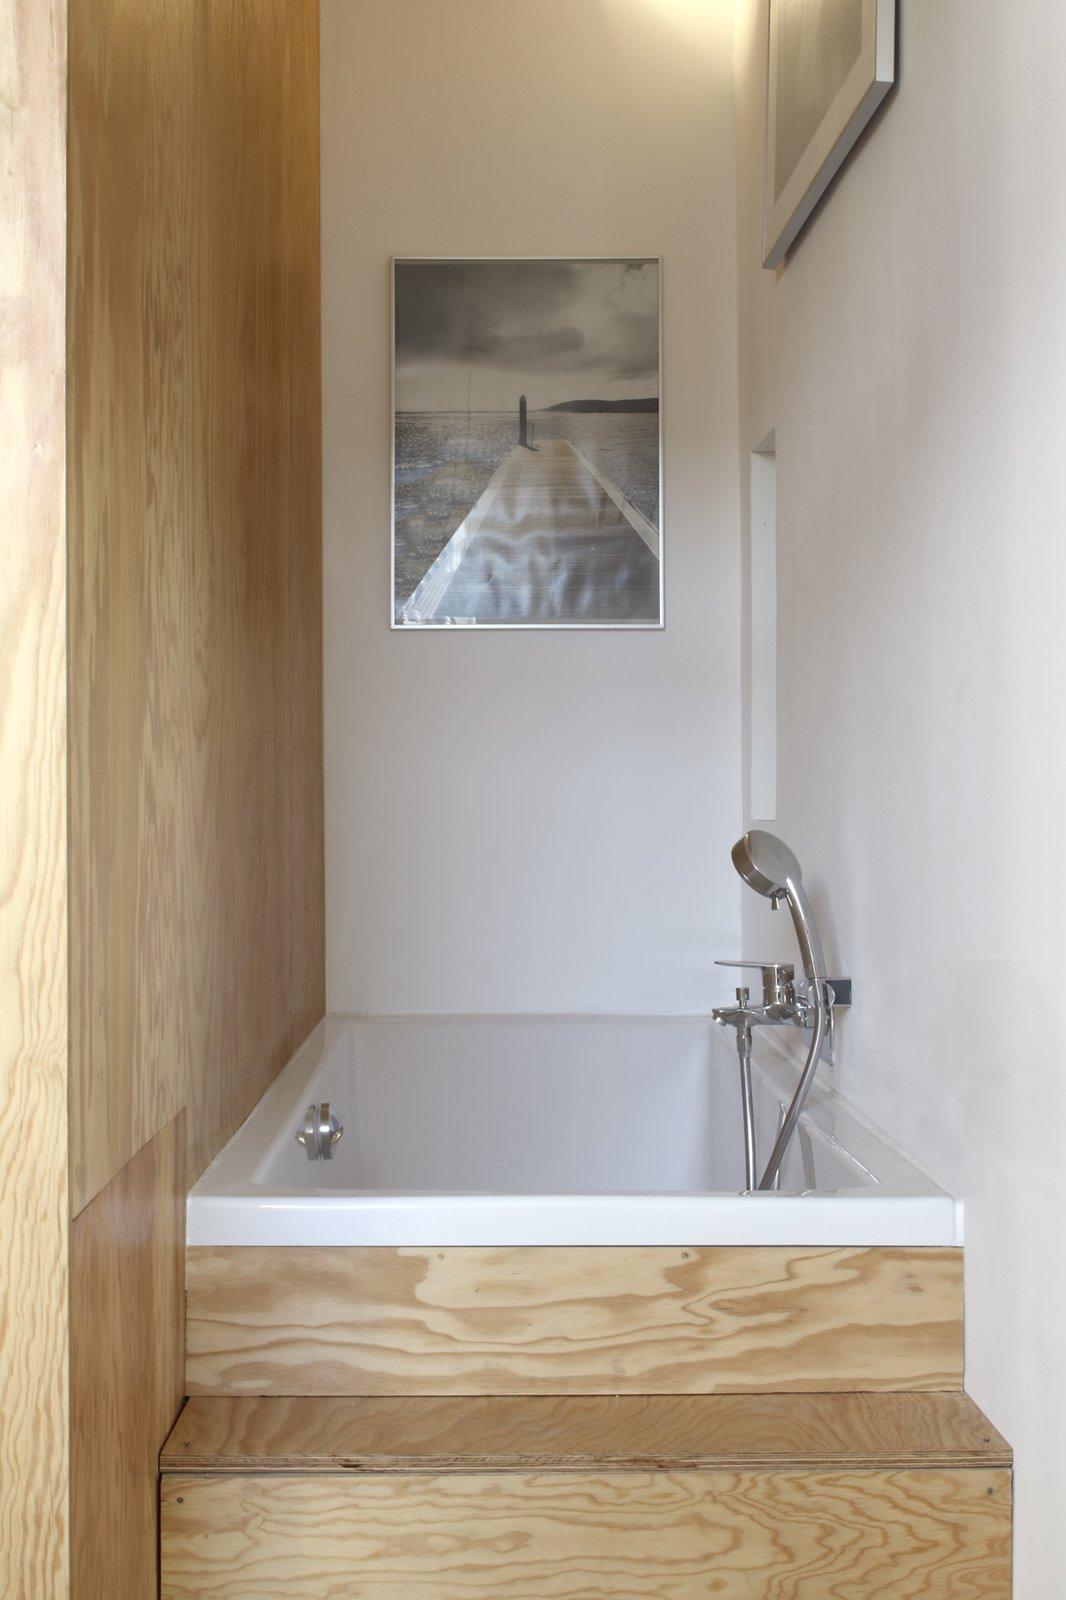 Pine Flat bathtub